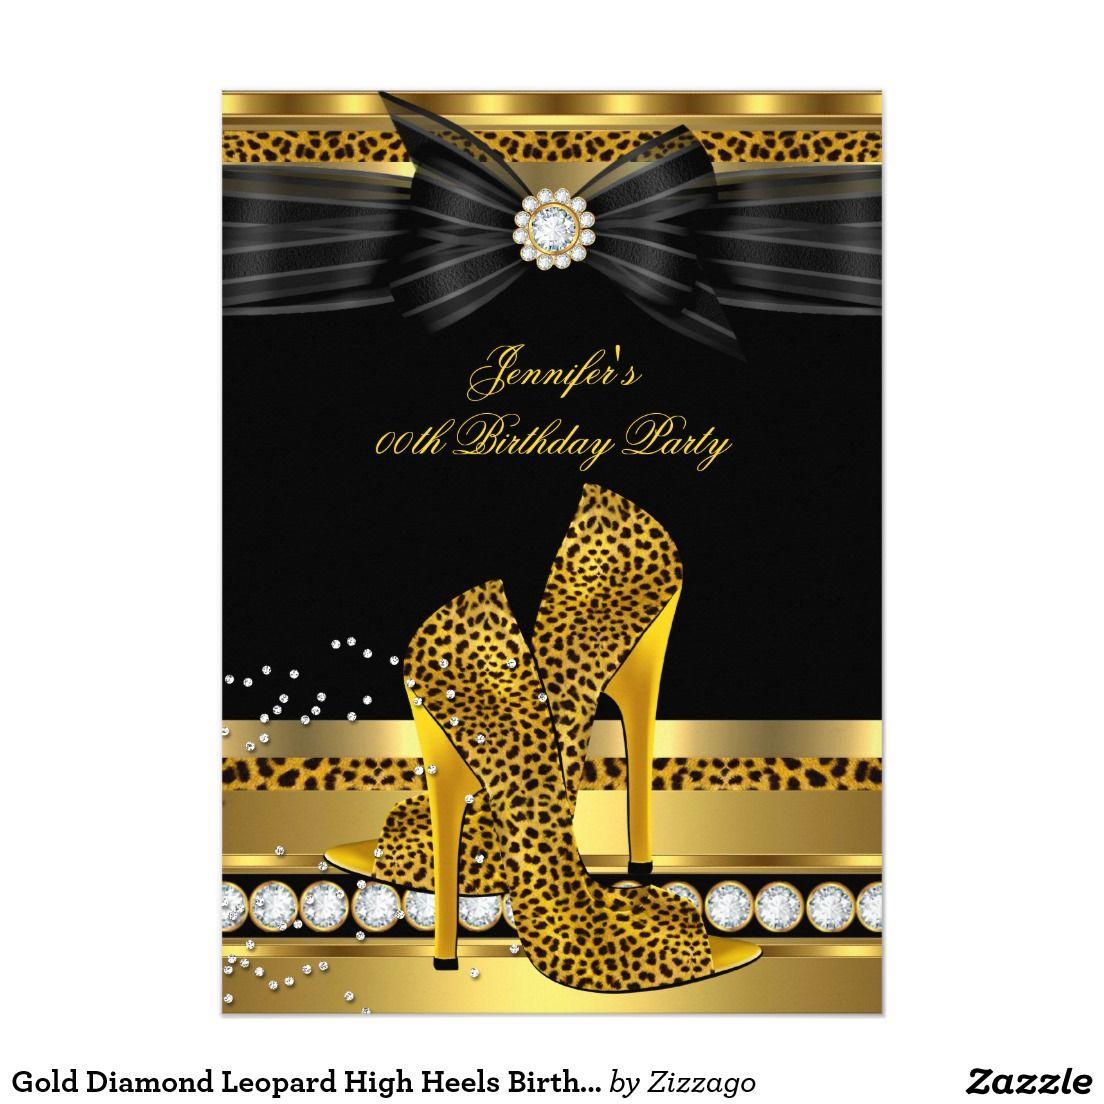 Gold Diamond Leopard High Heels Birthday Party 5x7 Paper Invitation ...